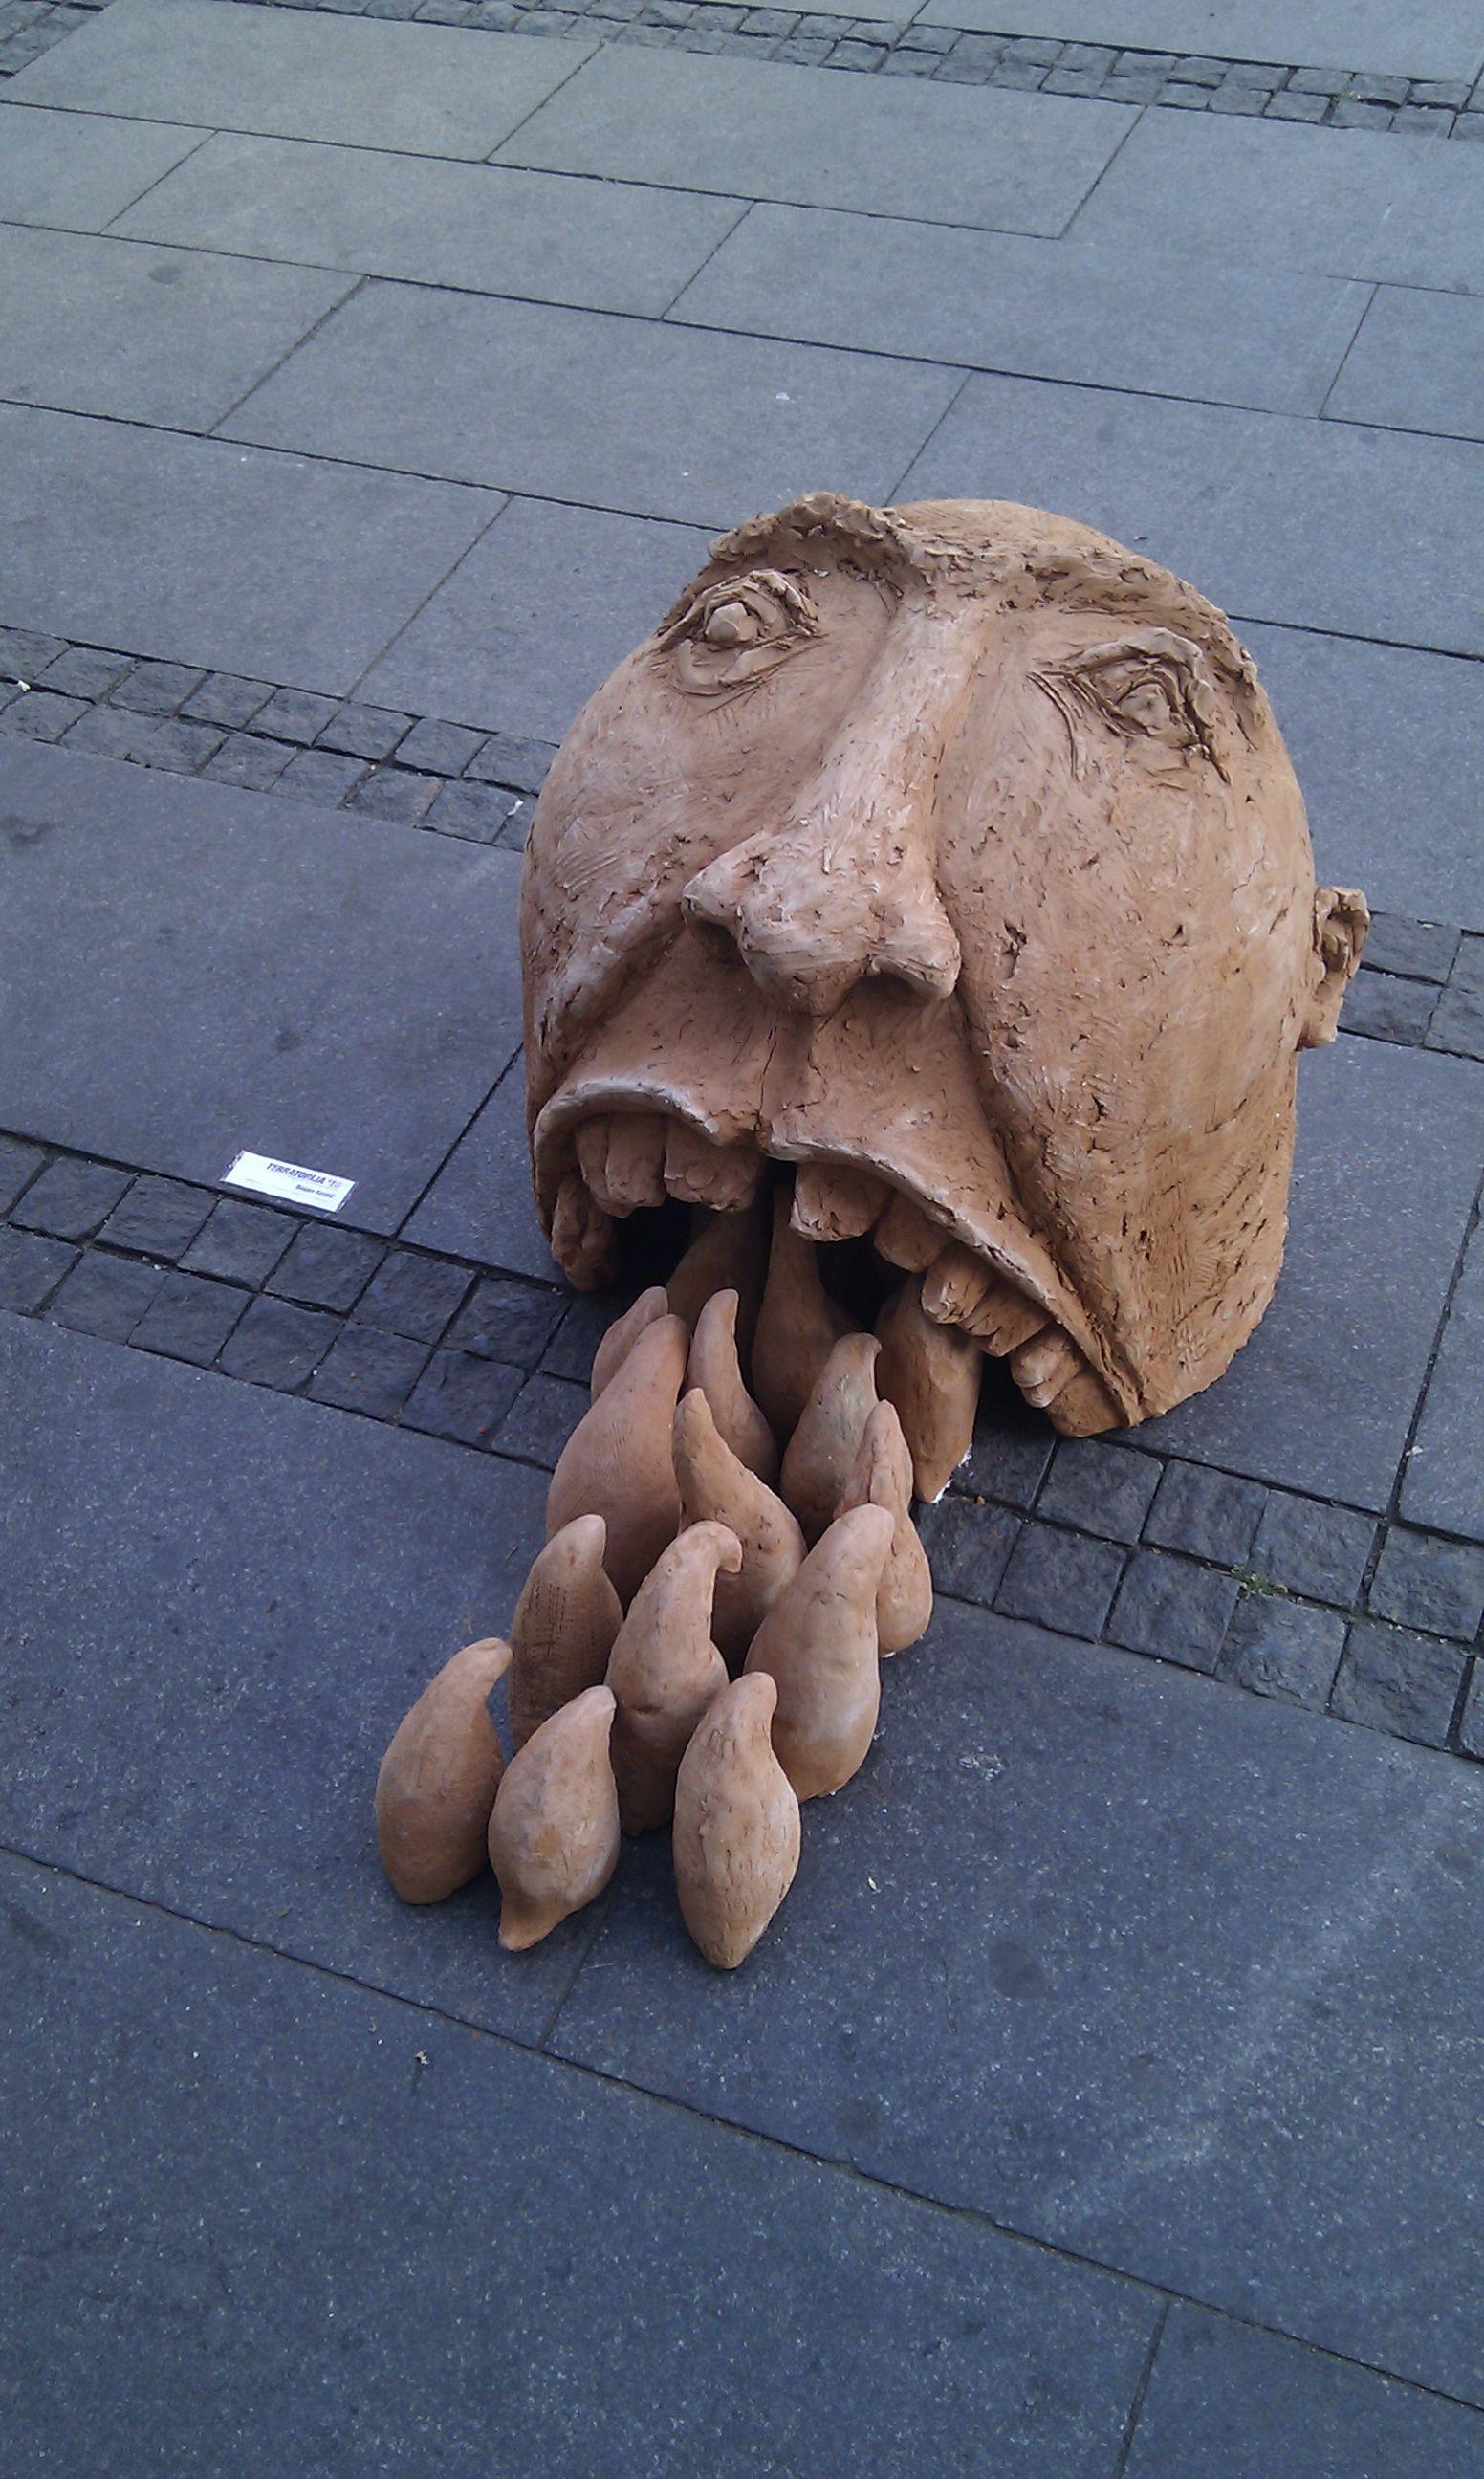 Artwork on display in Republic Square, Belgrade.